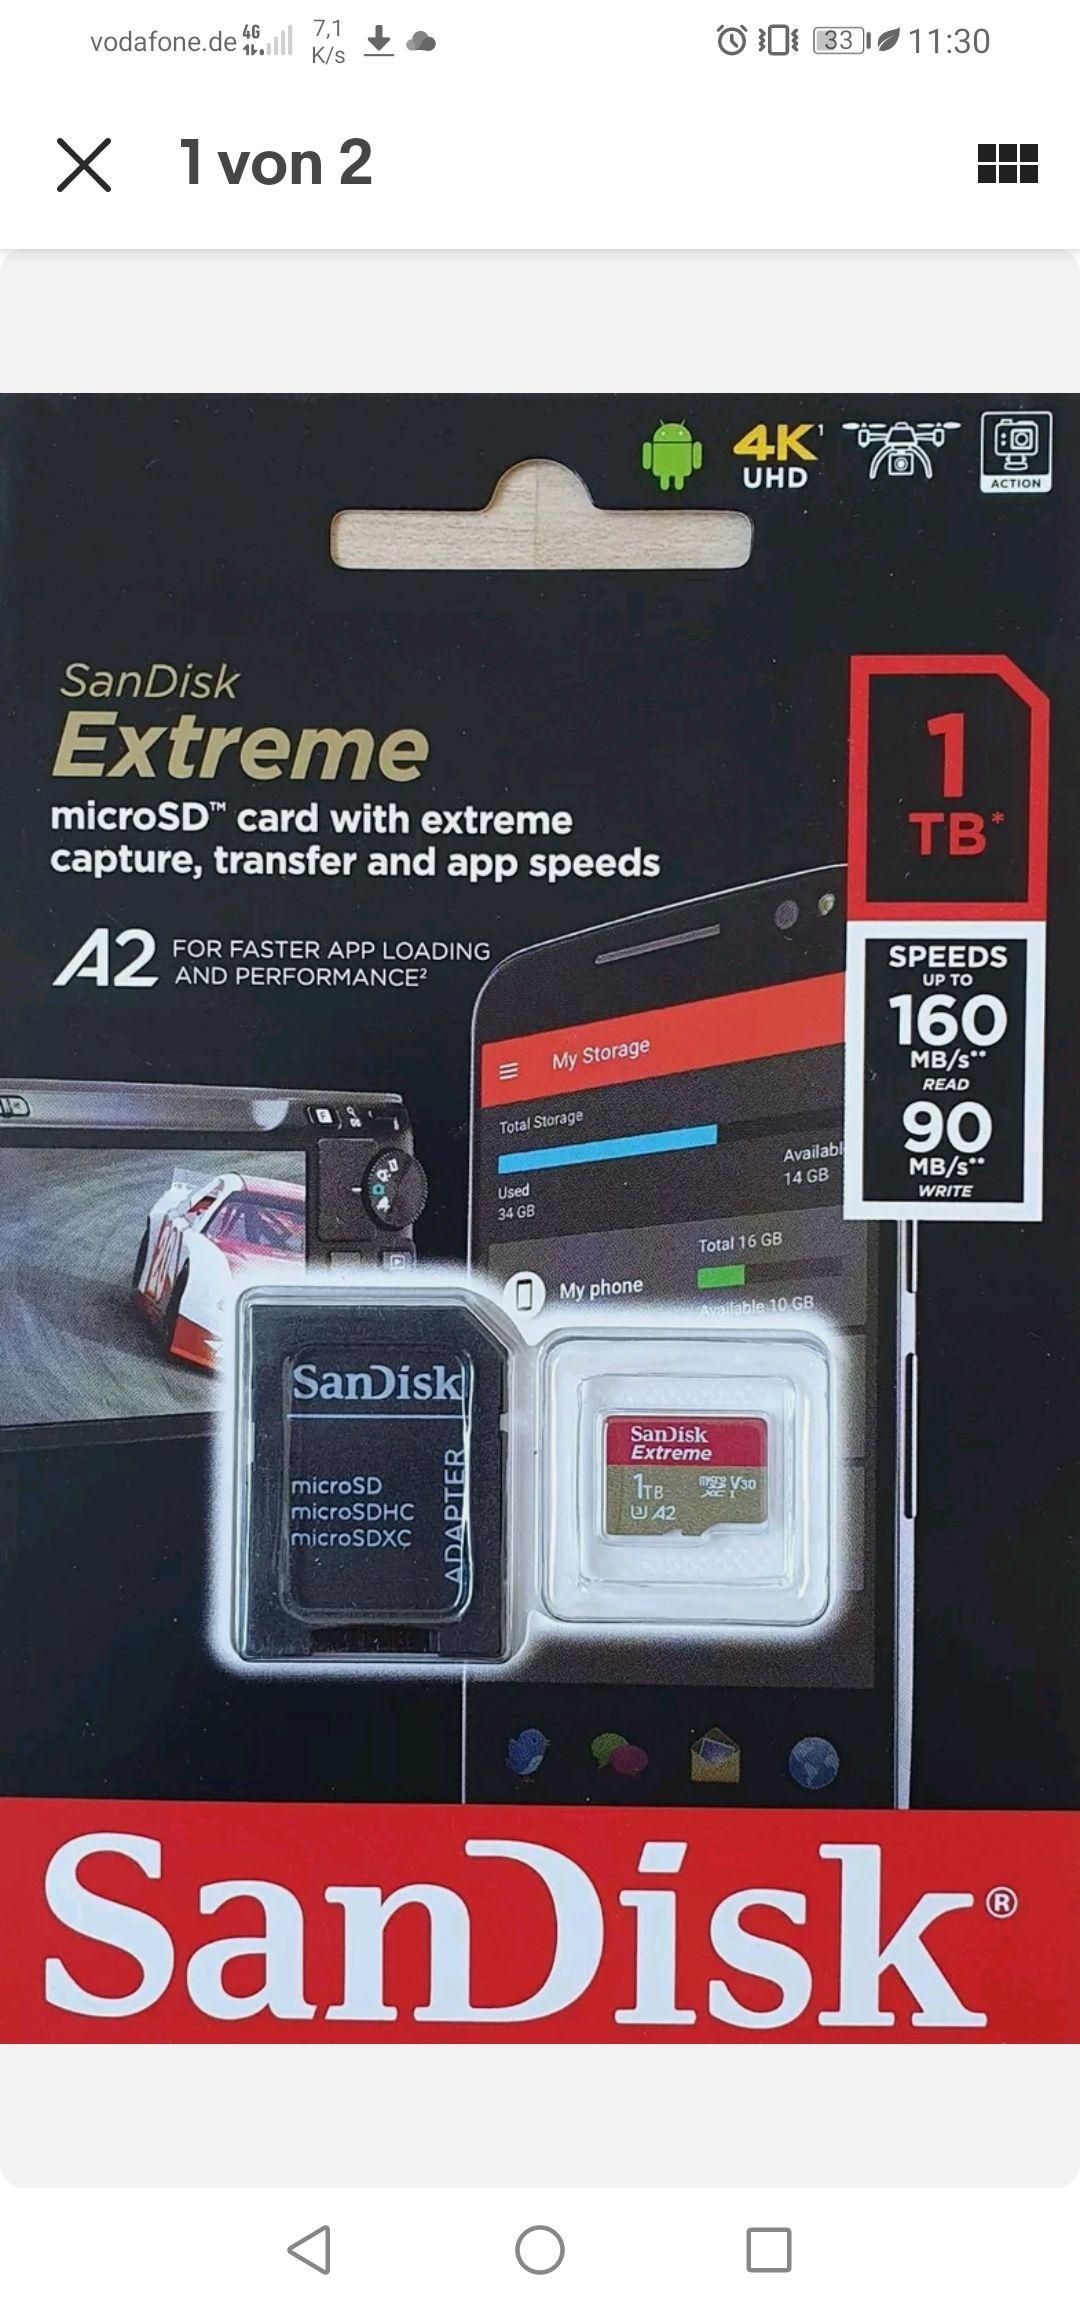 SanDisk Extreme 1TB A2 U3 V30 microSD